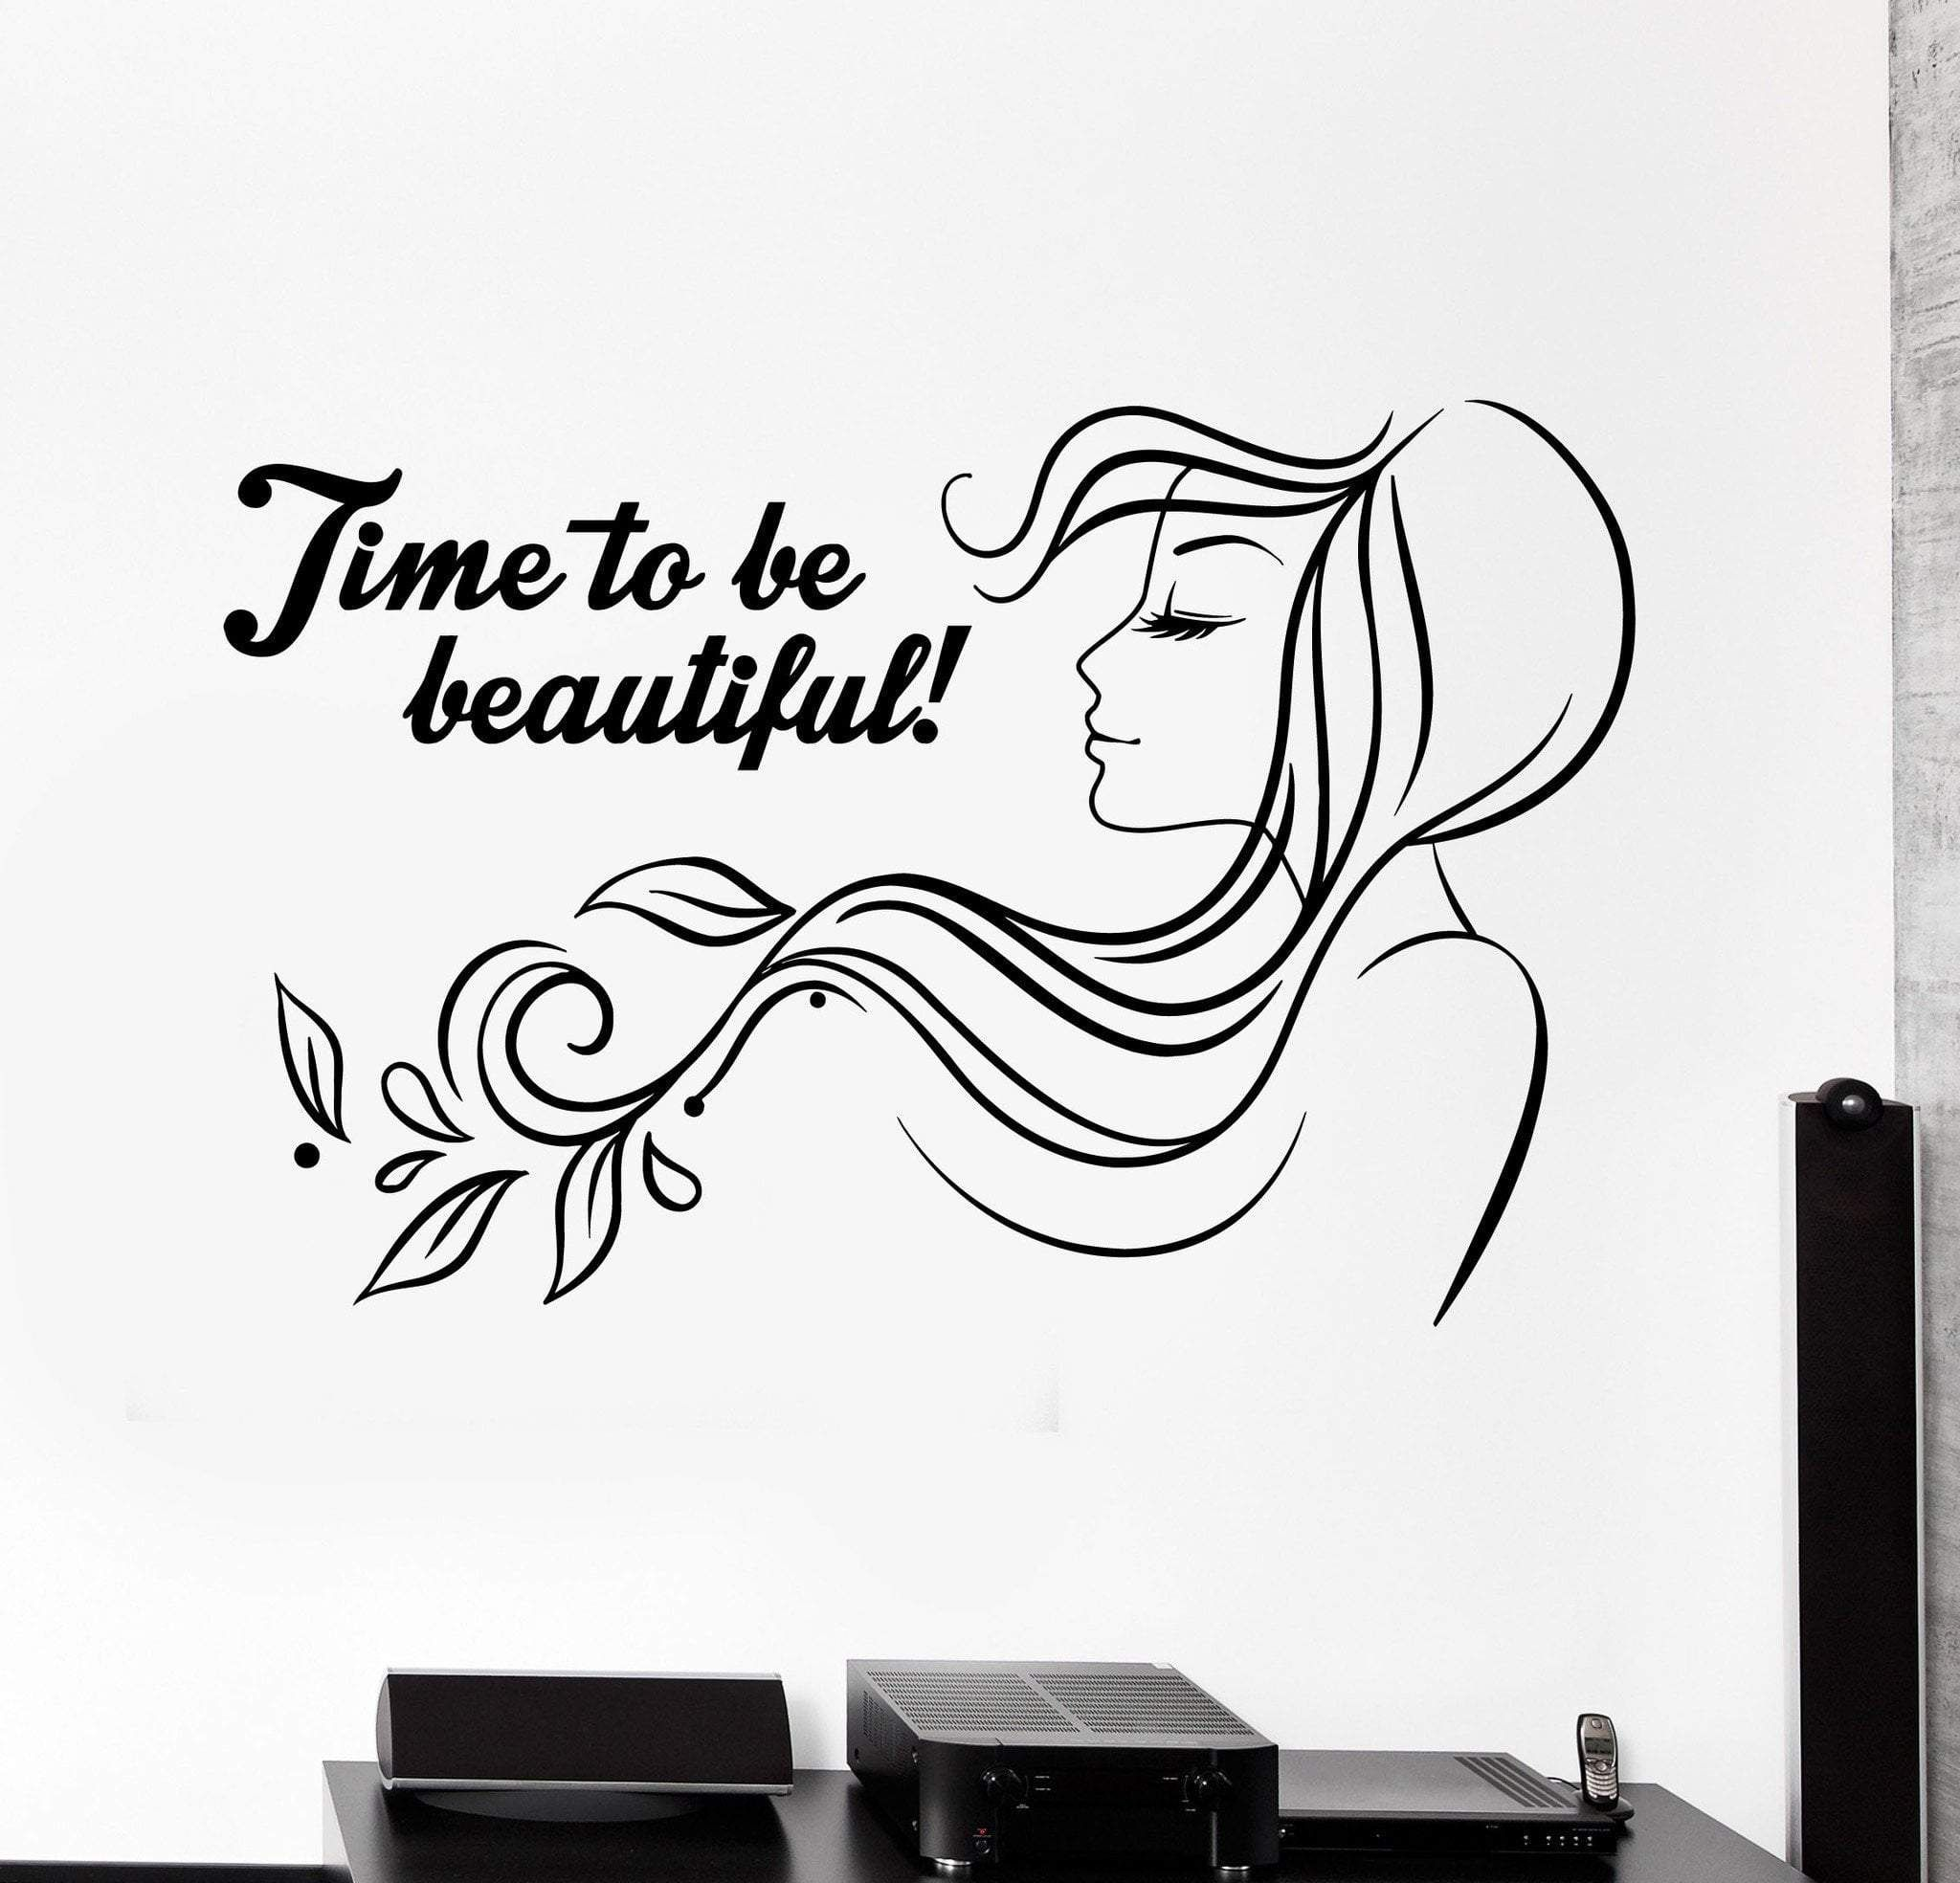 Vinyl Wall Decal Beauty Salon Quote Woman Hair Salon Stickers Mural Unique Gift Ig4614 Salon Quotes Hair Salon Logos Beauty Salon